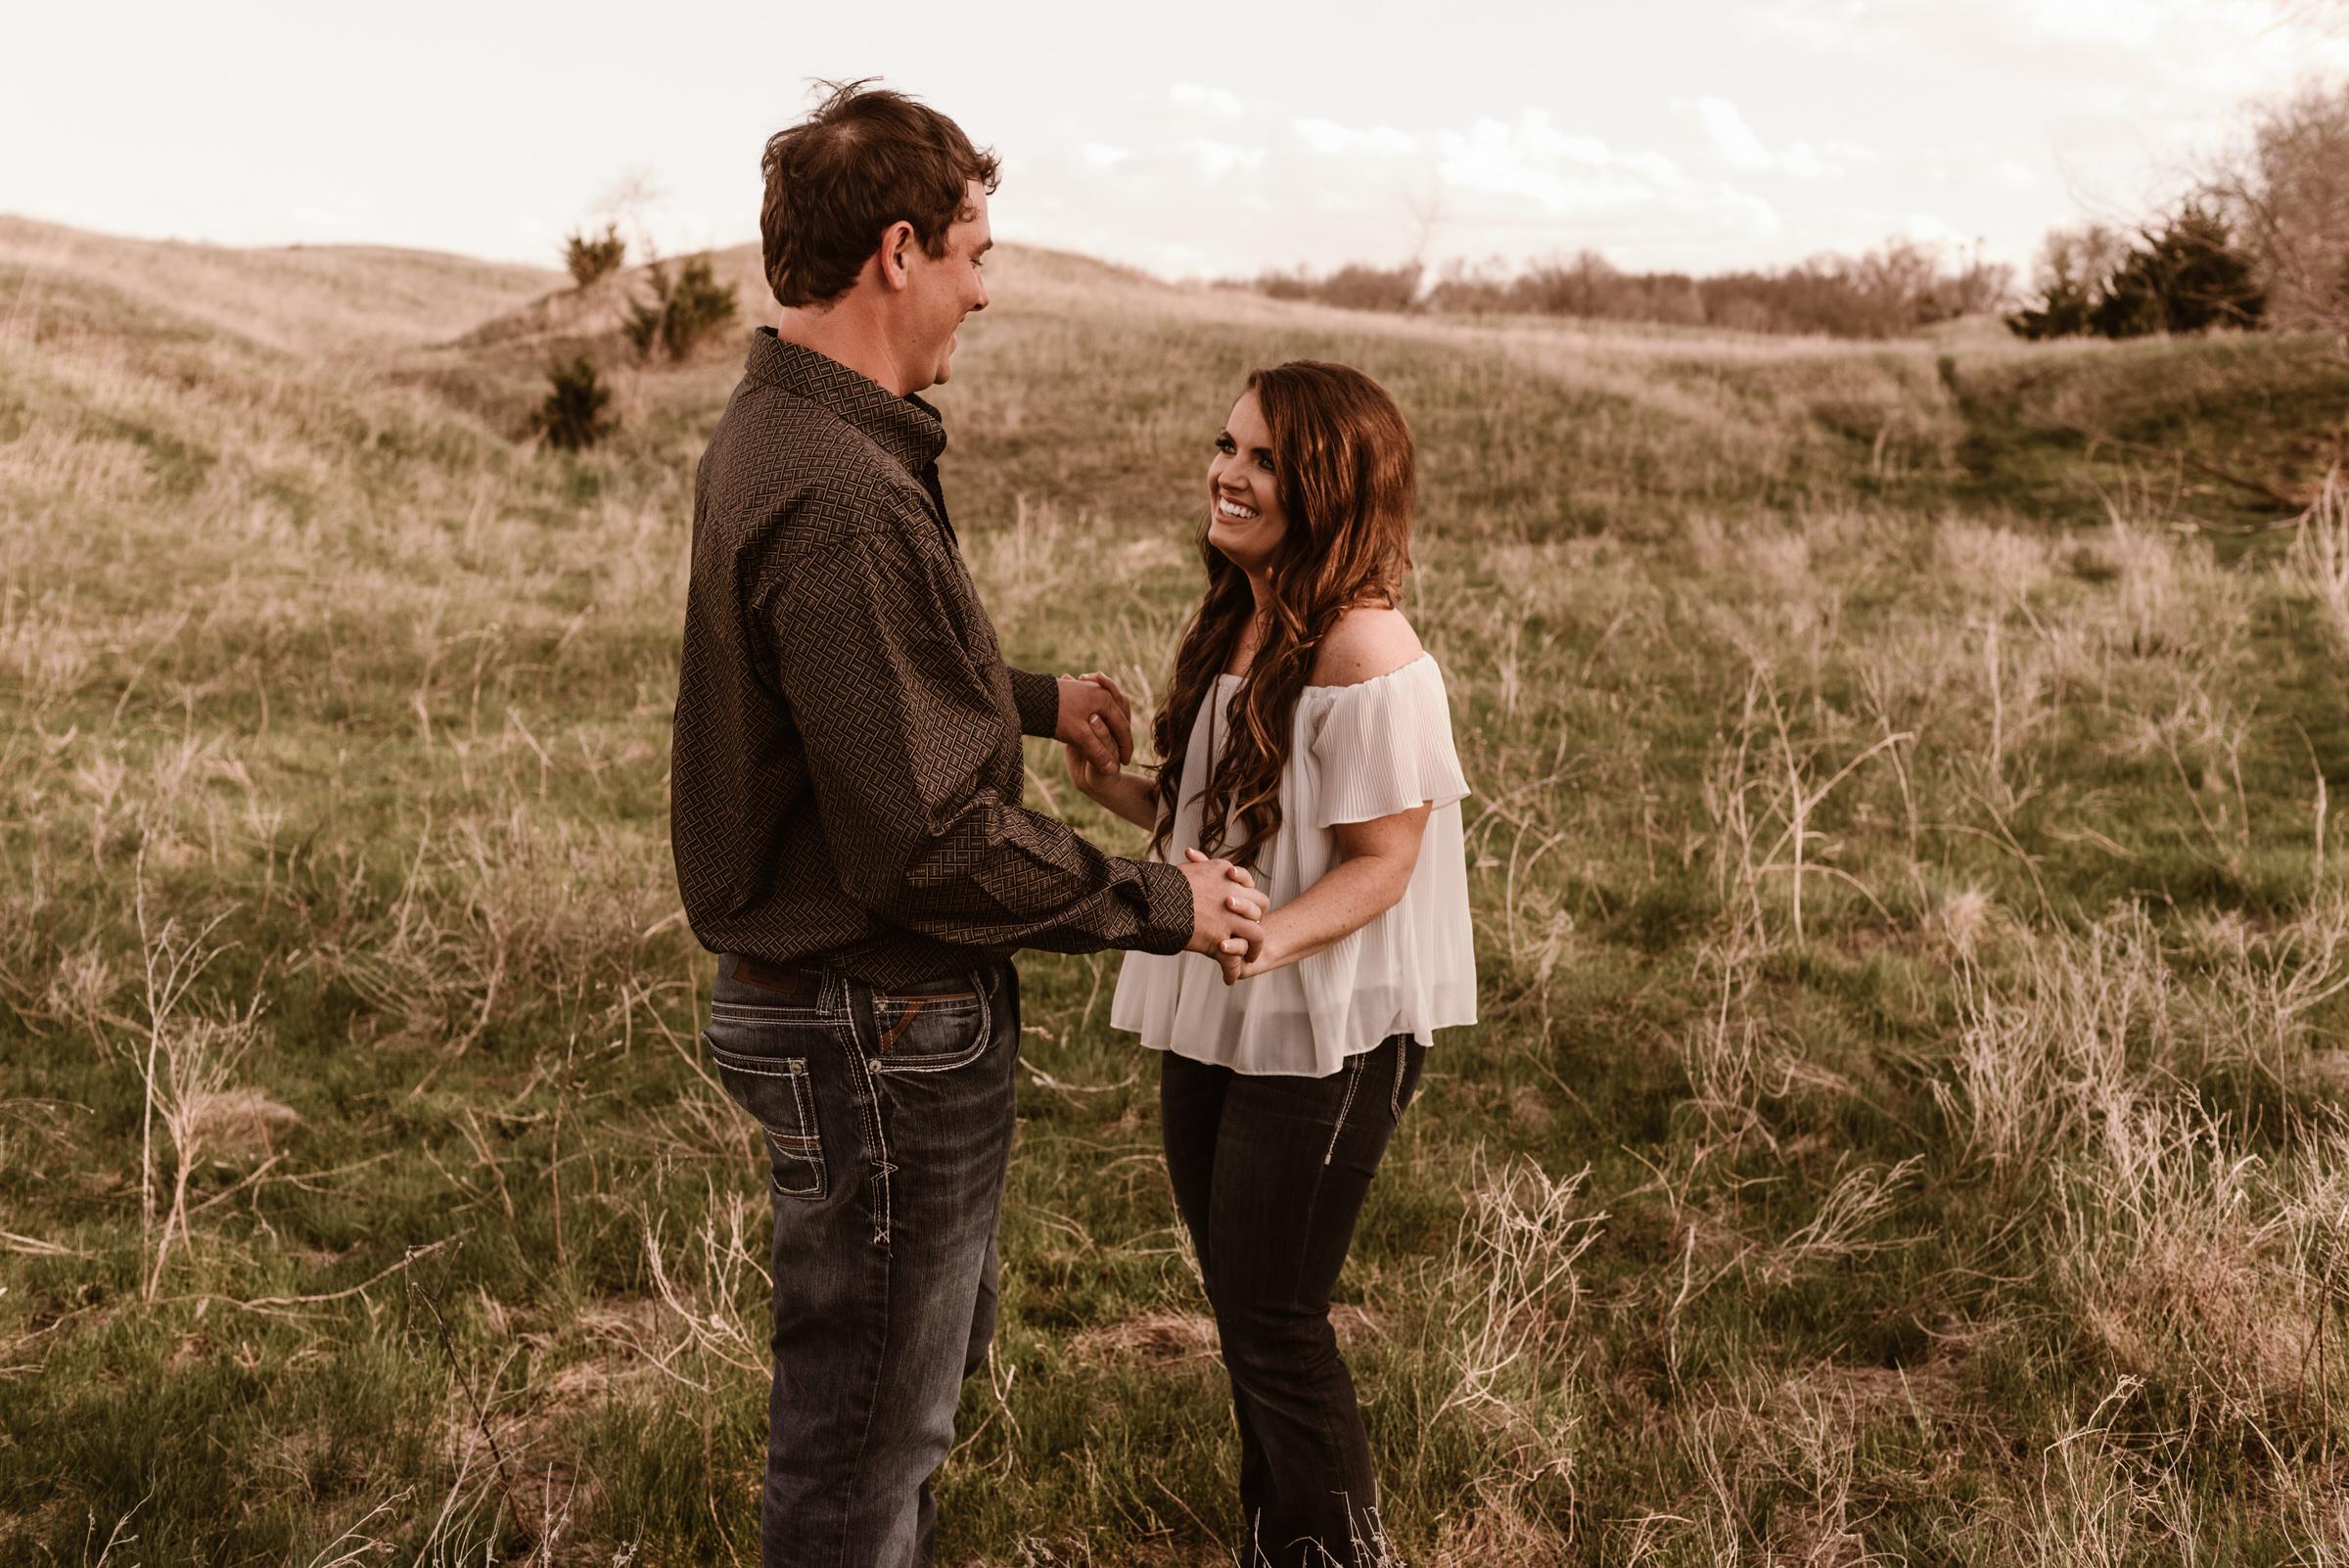 Sandhills-Nebraska-Engagement-Wedding-Photographer-Kaylie-Sirek-Photography-006.jpg